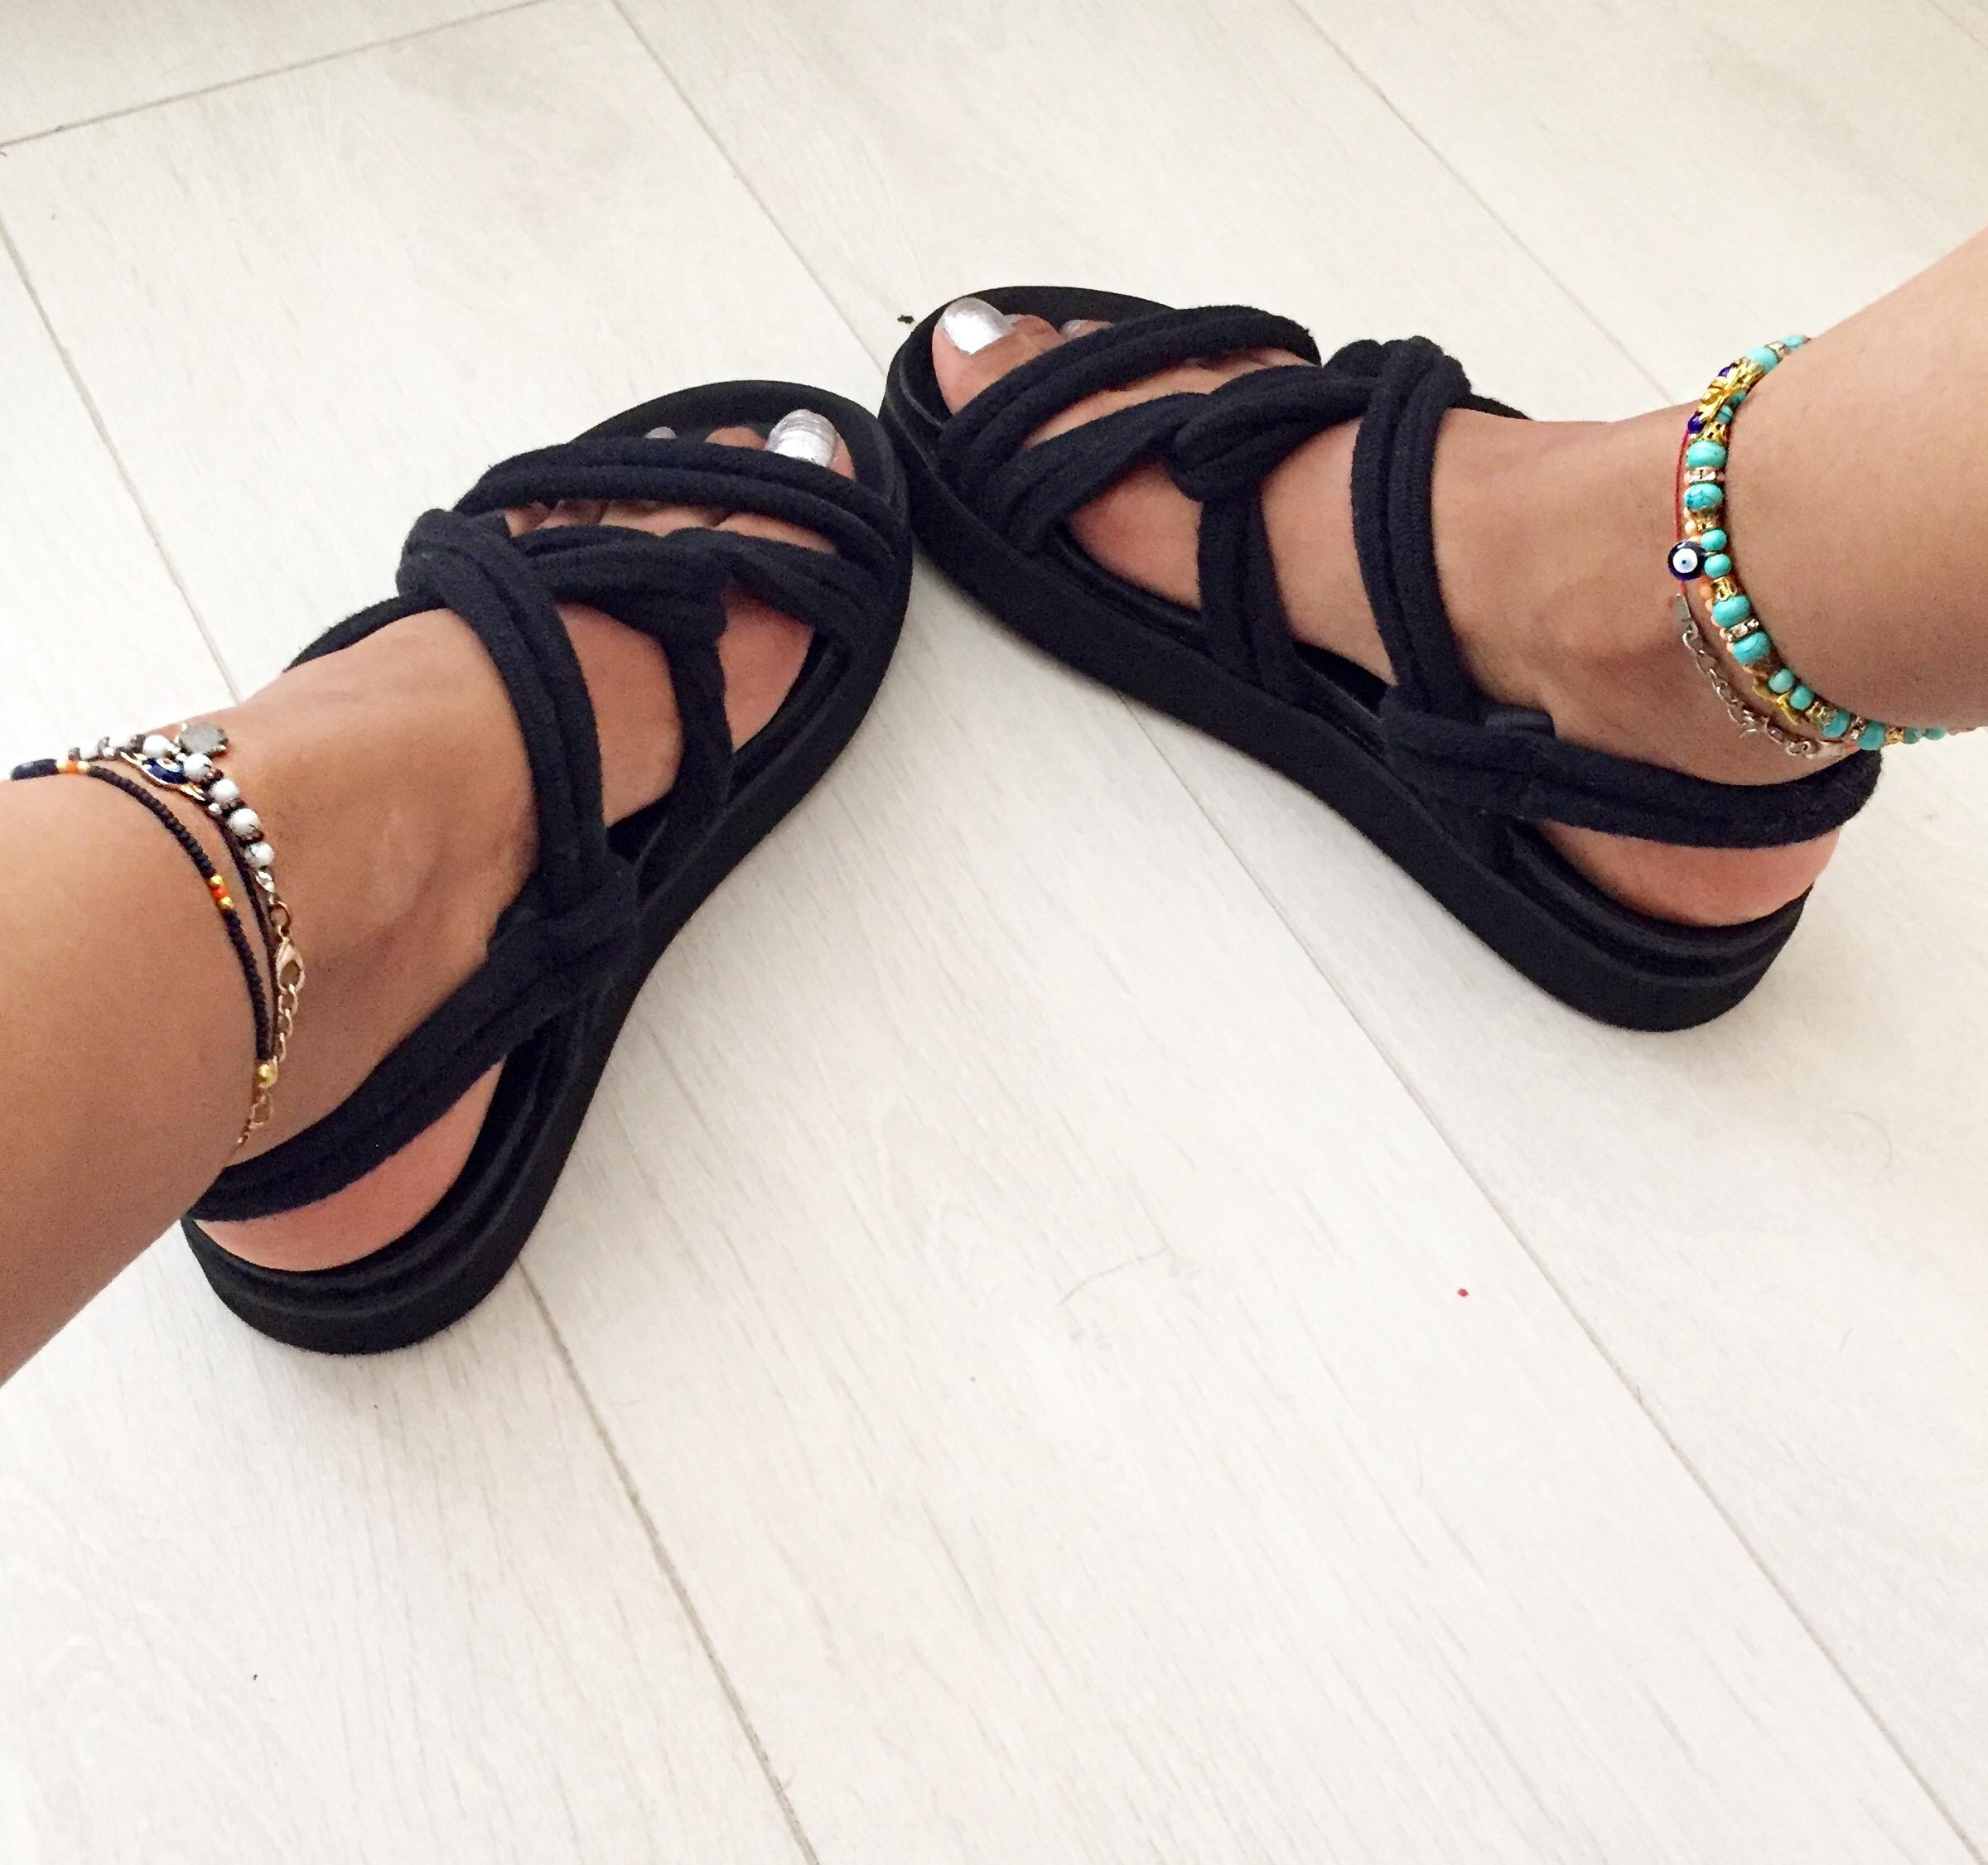 Sandals: Mango. Bracelets: Turkey